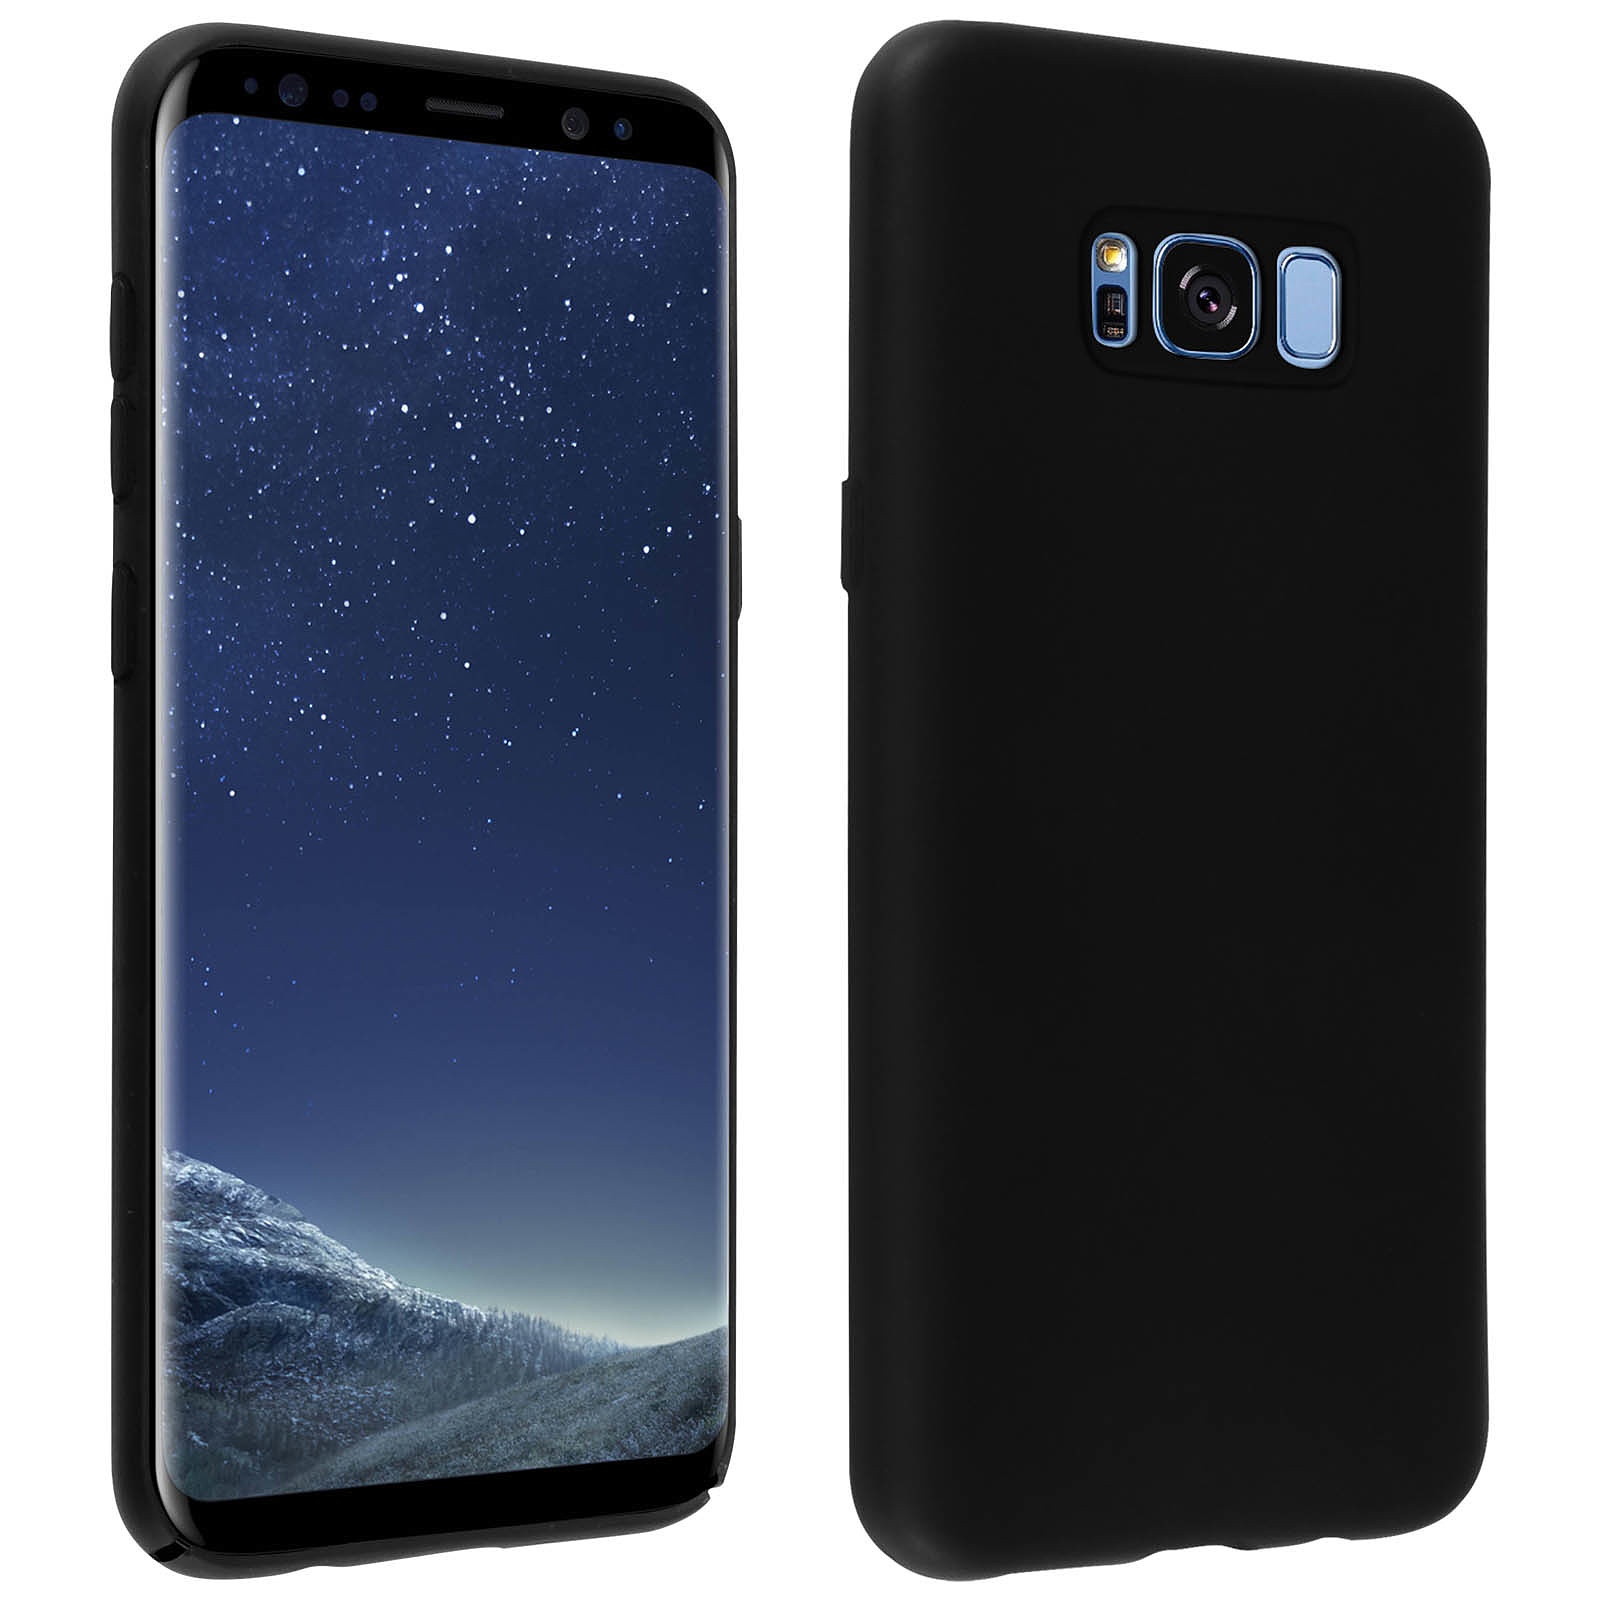 Avizar Coque Noir pour Samsung Galaxy S8 Plus